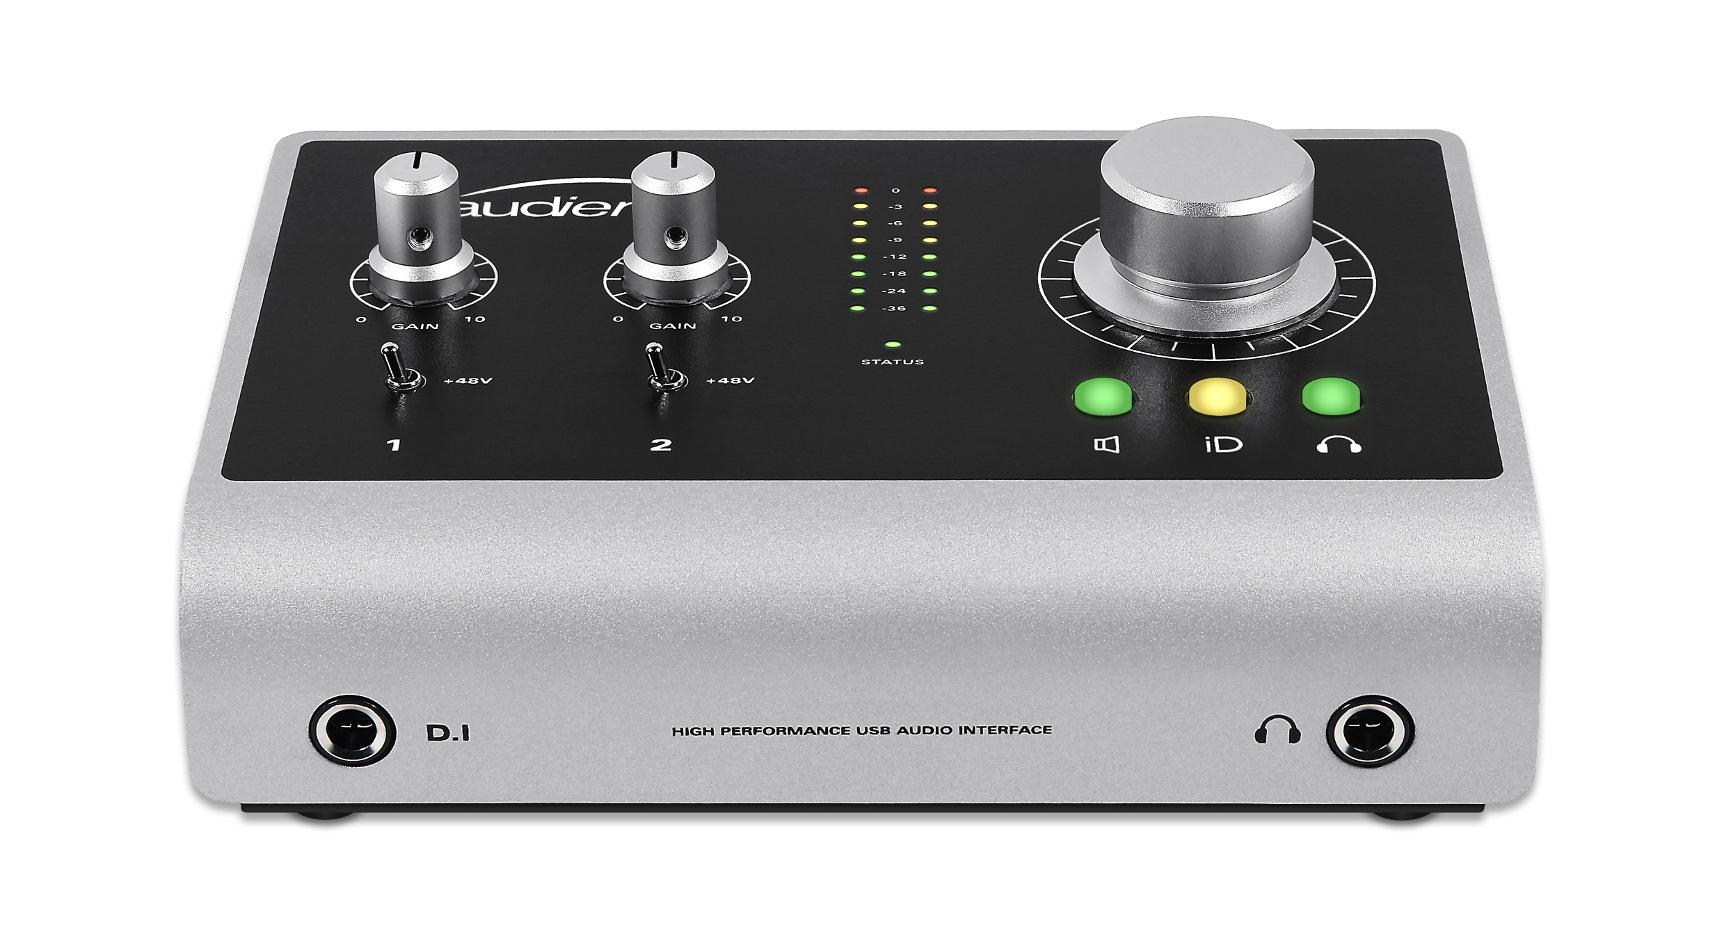 High Performance USB Audio Interface